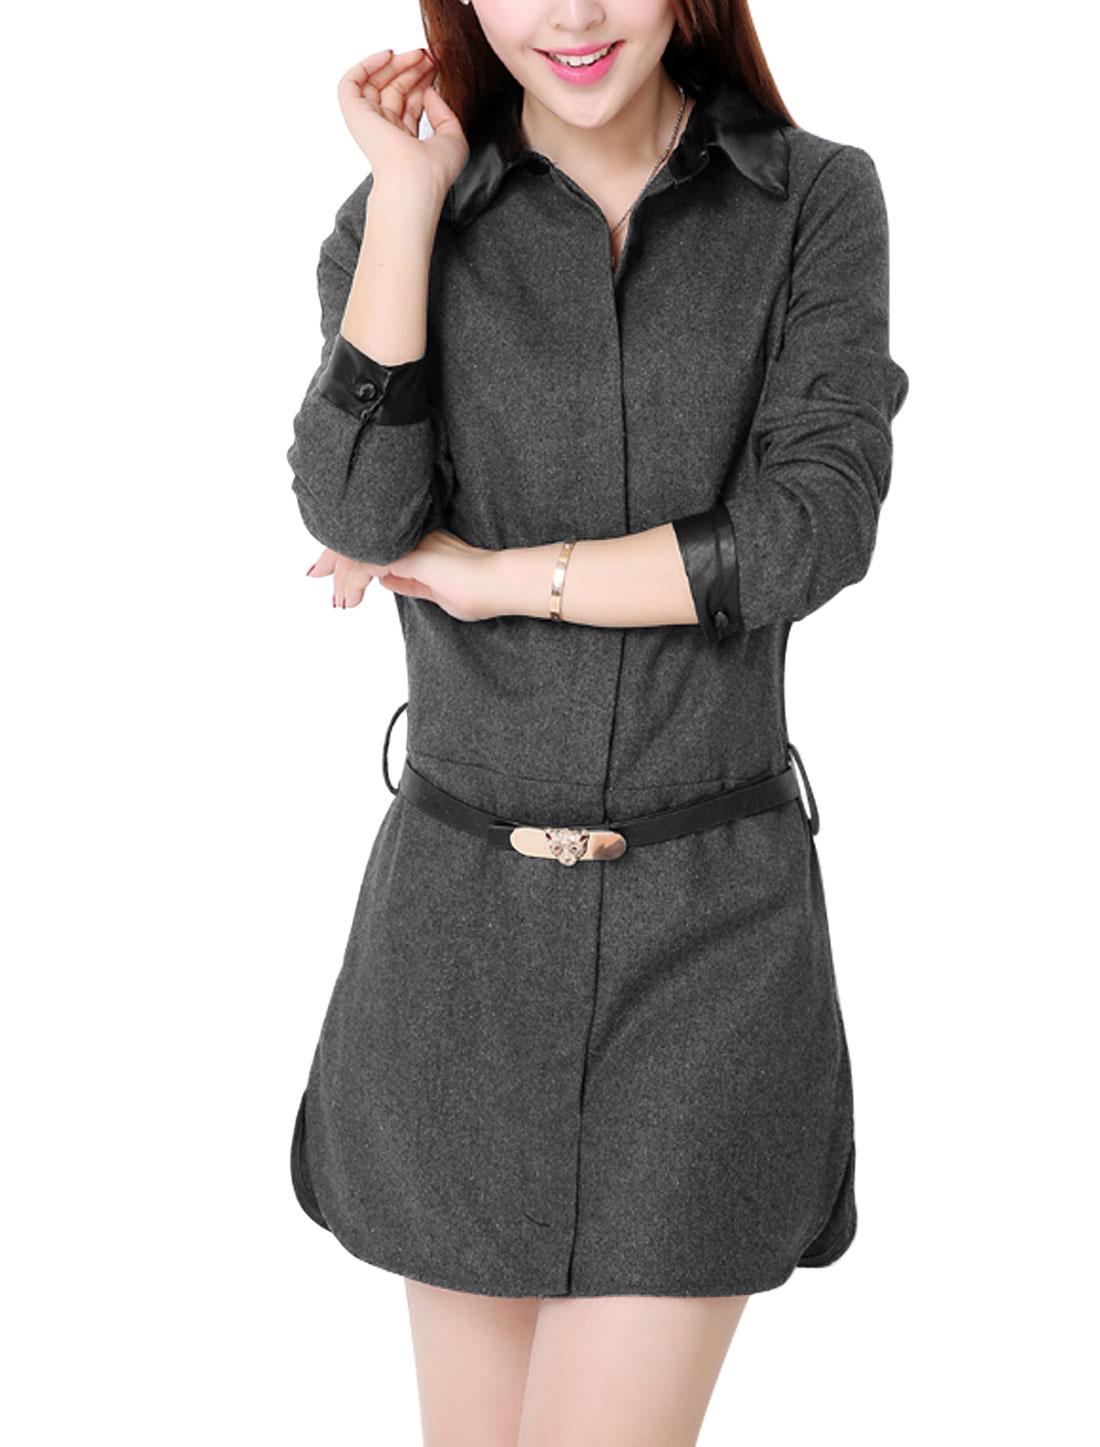 Lady Long Sleeve Button Cuffs Point Collar Dress w Belt Dark Gray S